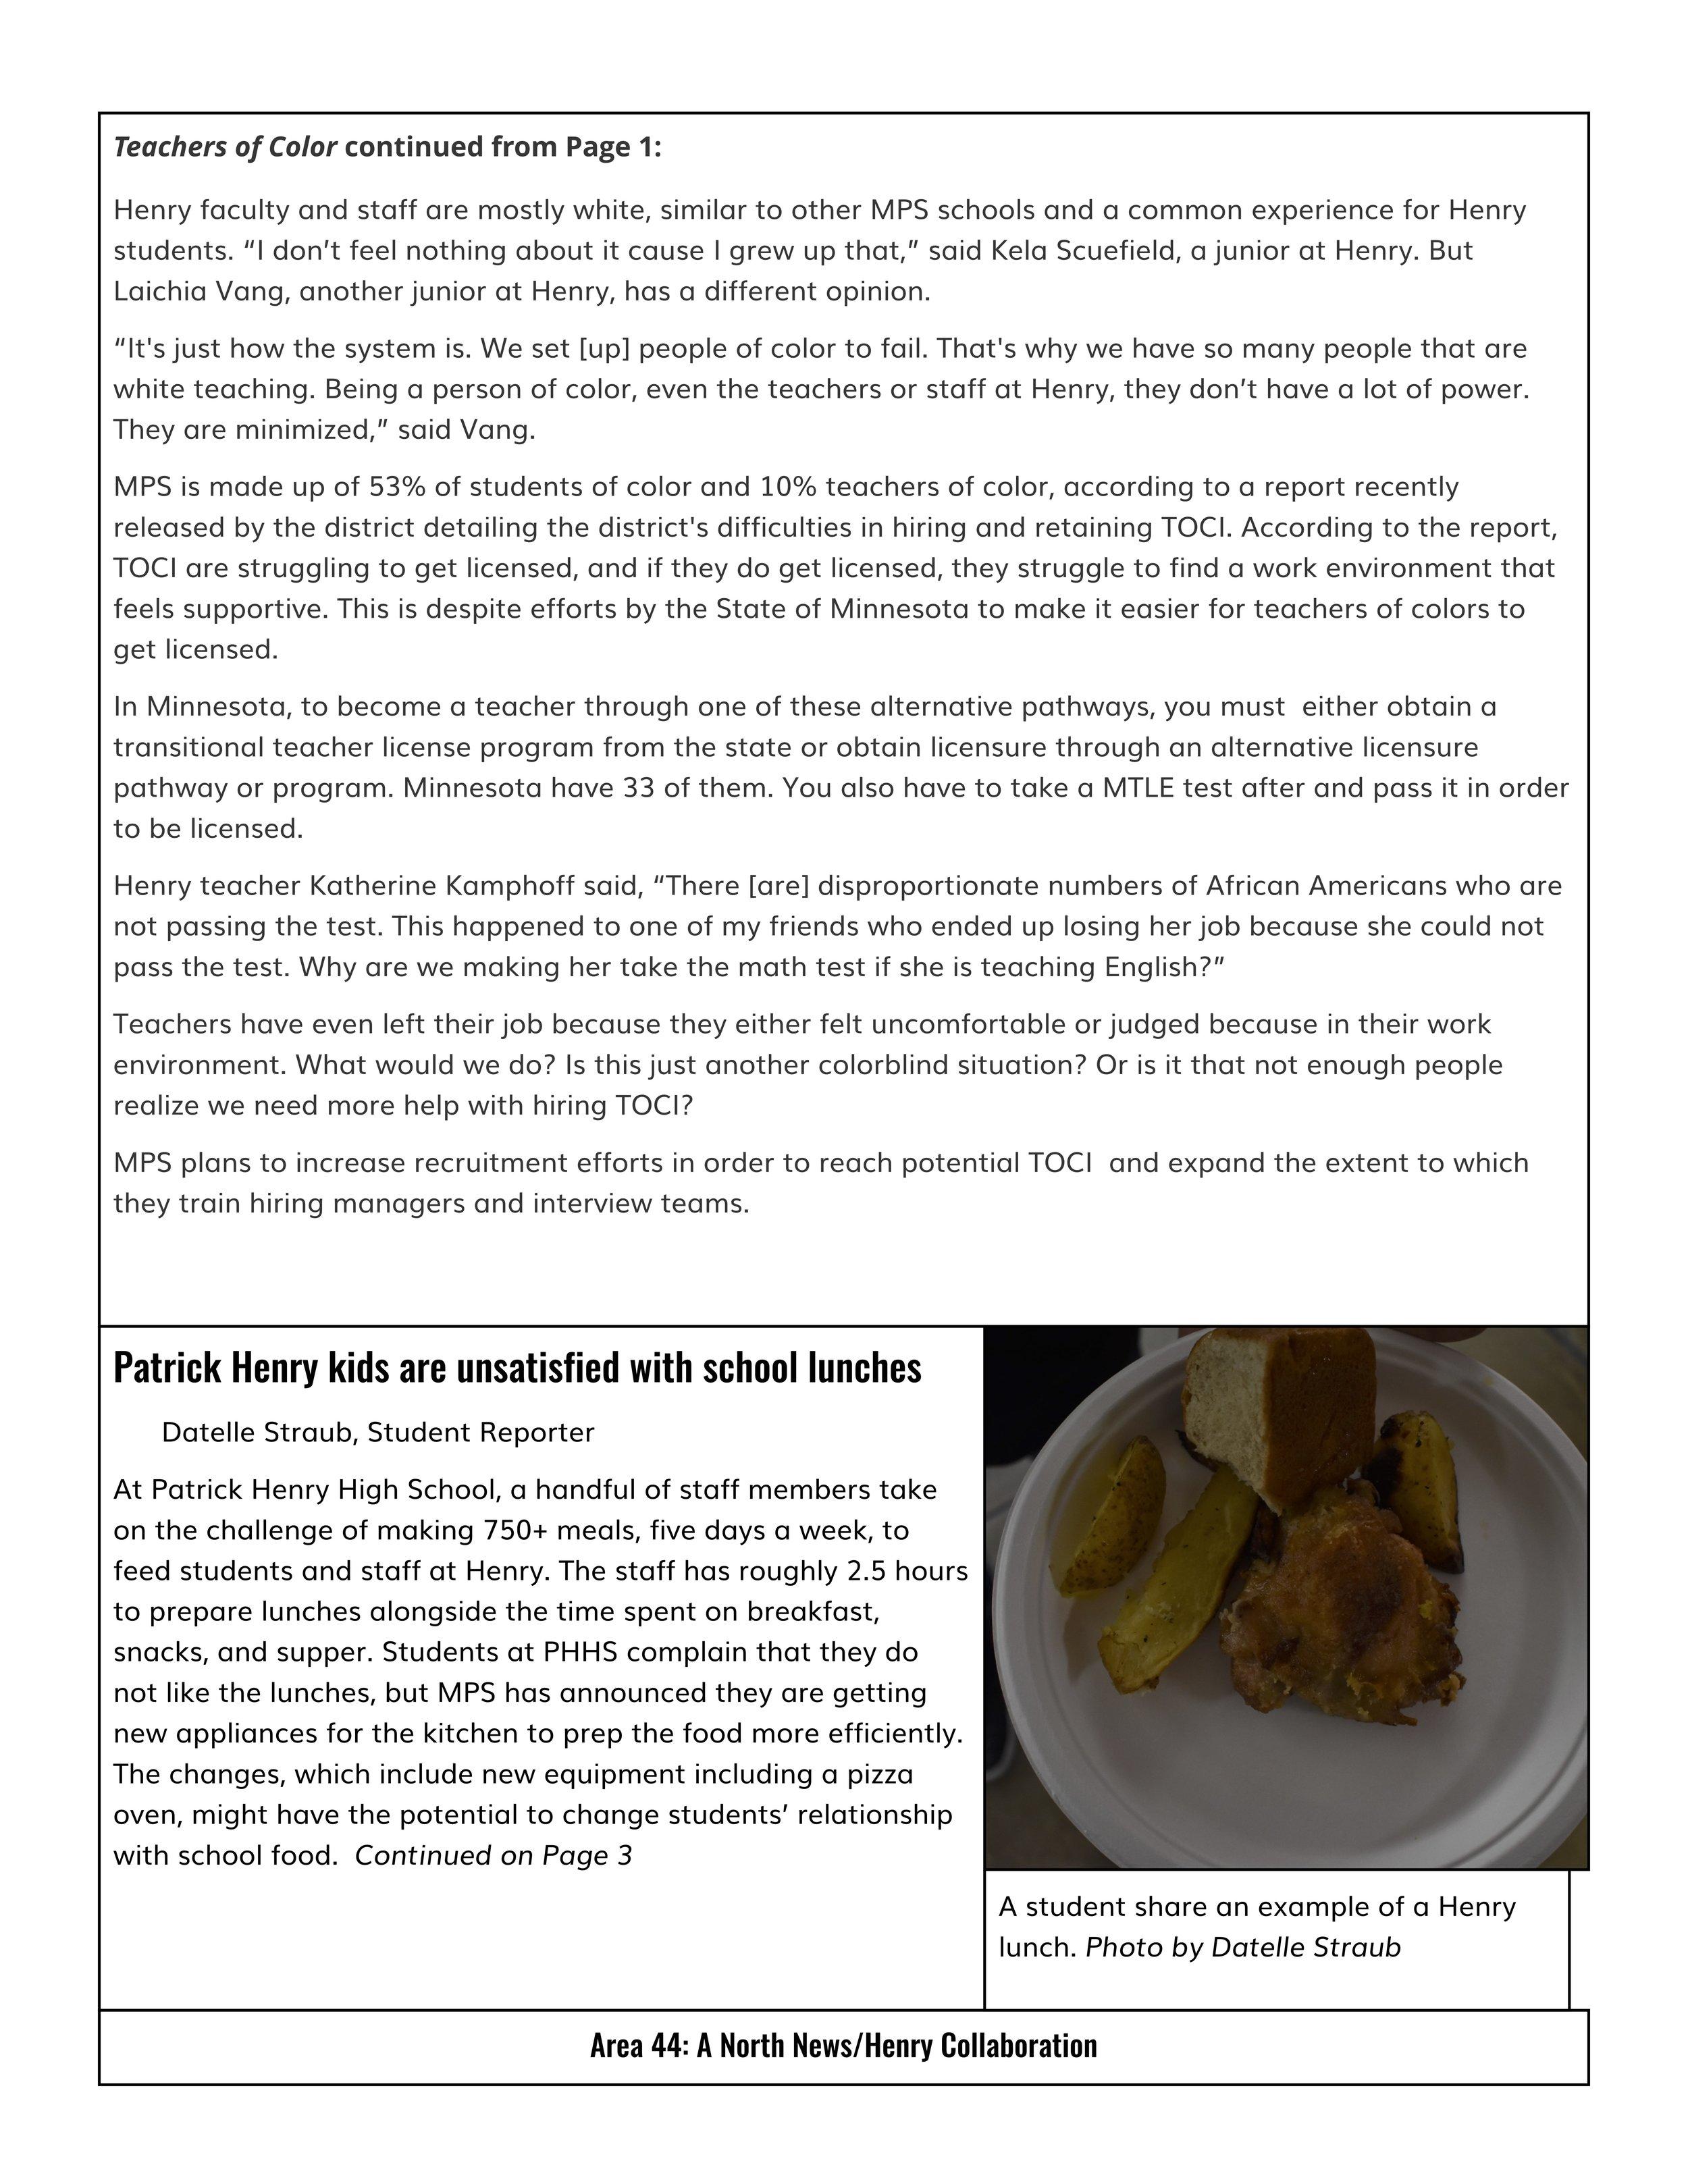 Area 44_ Issue 1_ Final Draft2p.jpg